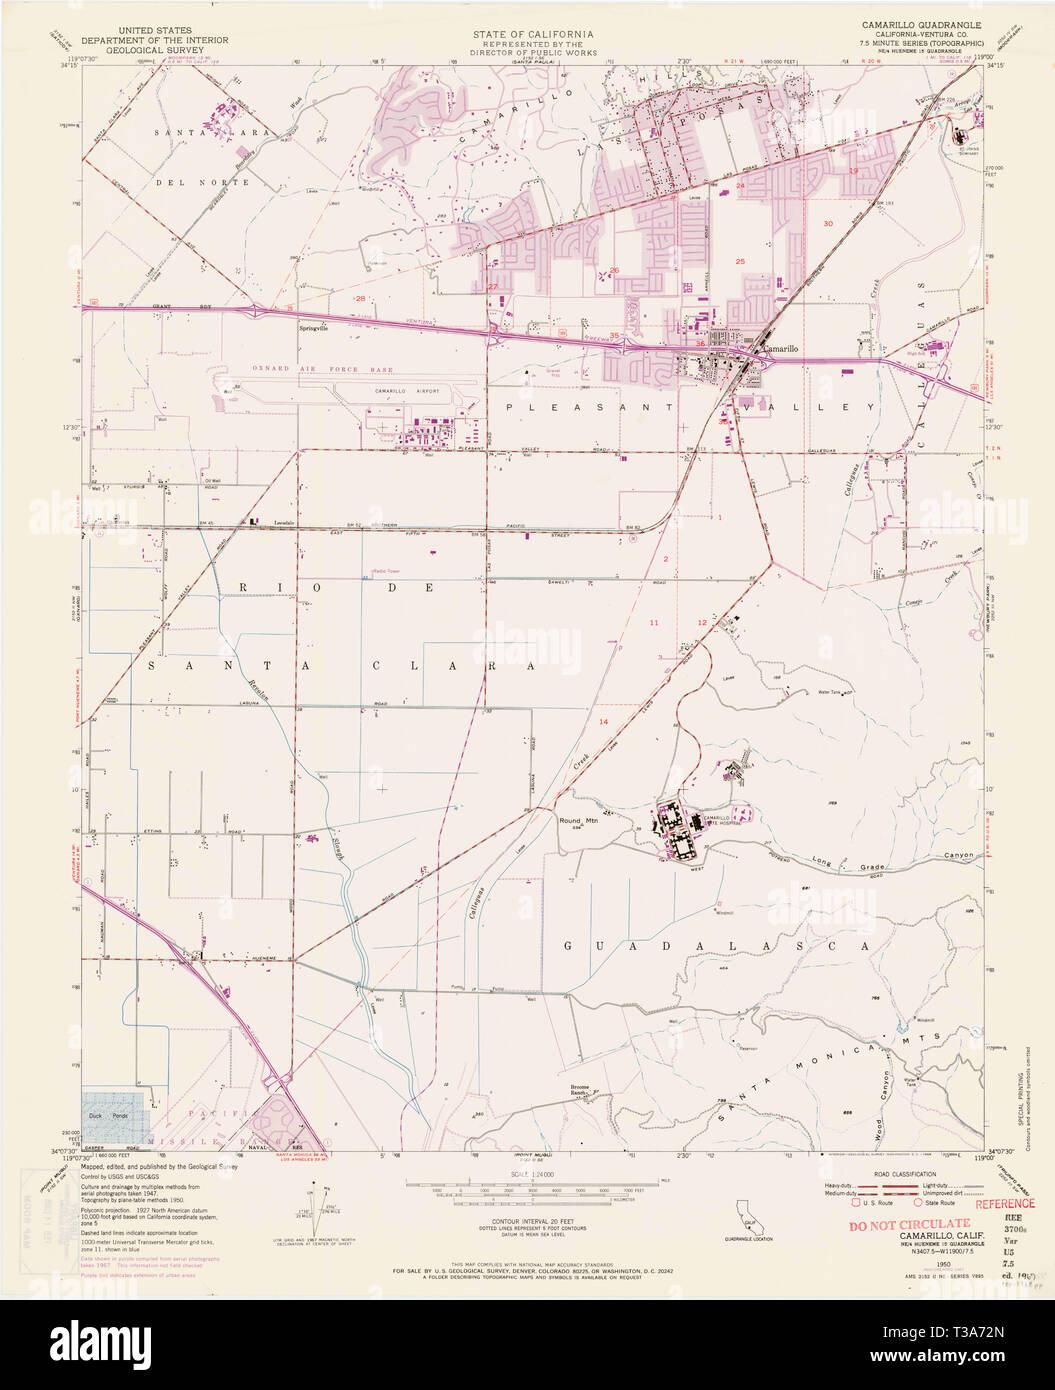 USGS TOPO Map California CA Camarillo 302575 1950 24000 ... Map Camarillo Ca on conejo valley ca map, hollywood beach ca map, las vegas ca map, camarillo fire 2013, chula vista ca map, livermore ca map, fort worth ca map, canyon country ca map, foothill ranch ca map, forestville ca map, carson ca map, culver city ca map, rocklin ca map, carlsbad ca map, knoxville ca map, chicago ca map, solano beach ca map, camarillo mapquest, watsonville ca map, carpinteria ca map,